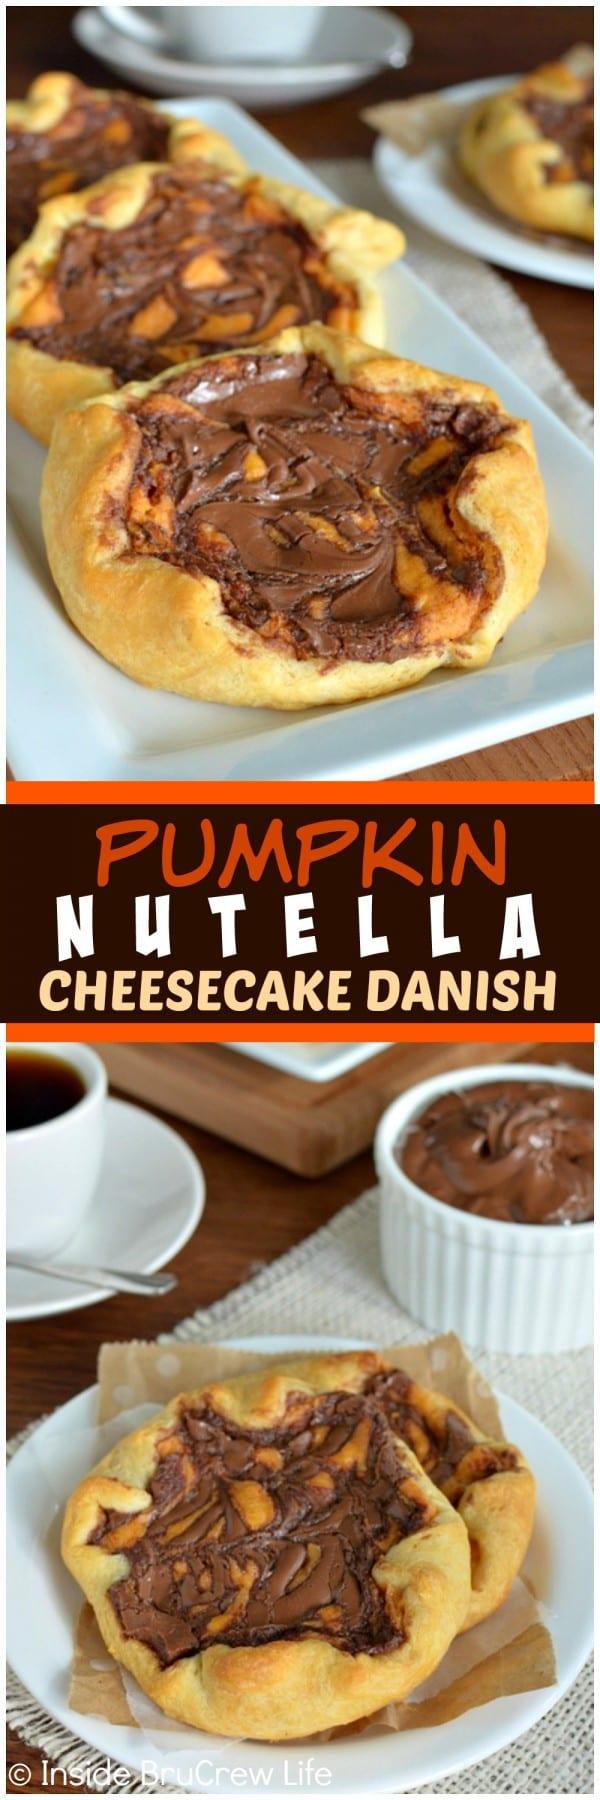 Pumpkin Nutella Cheesecake Danish - swirls of chocolate and cheesecake create a fun fall breakfast. Great recipe for enjoying with coffee!